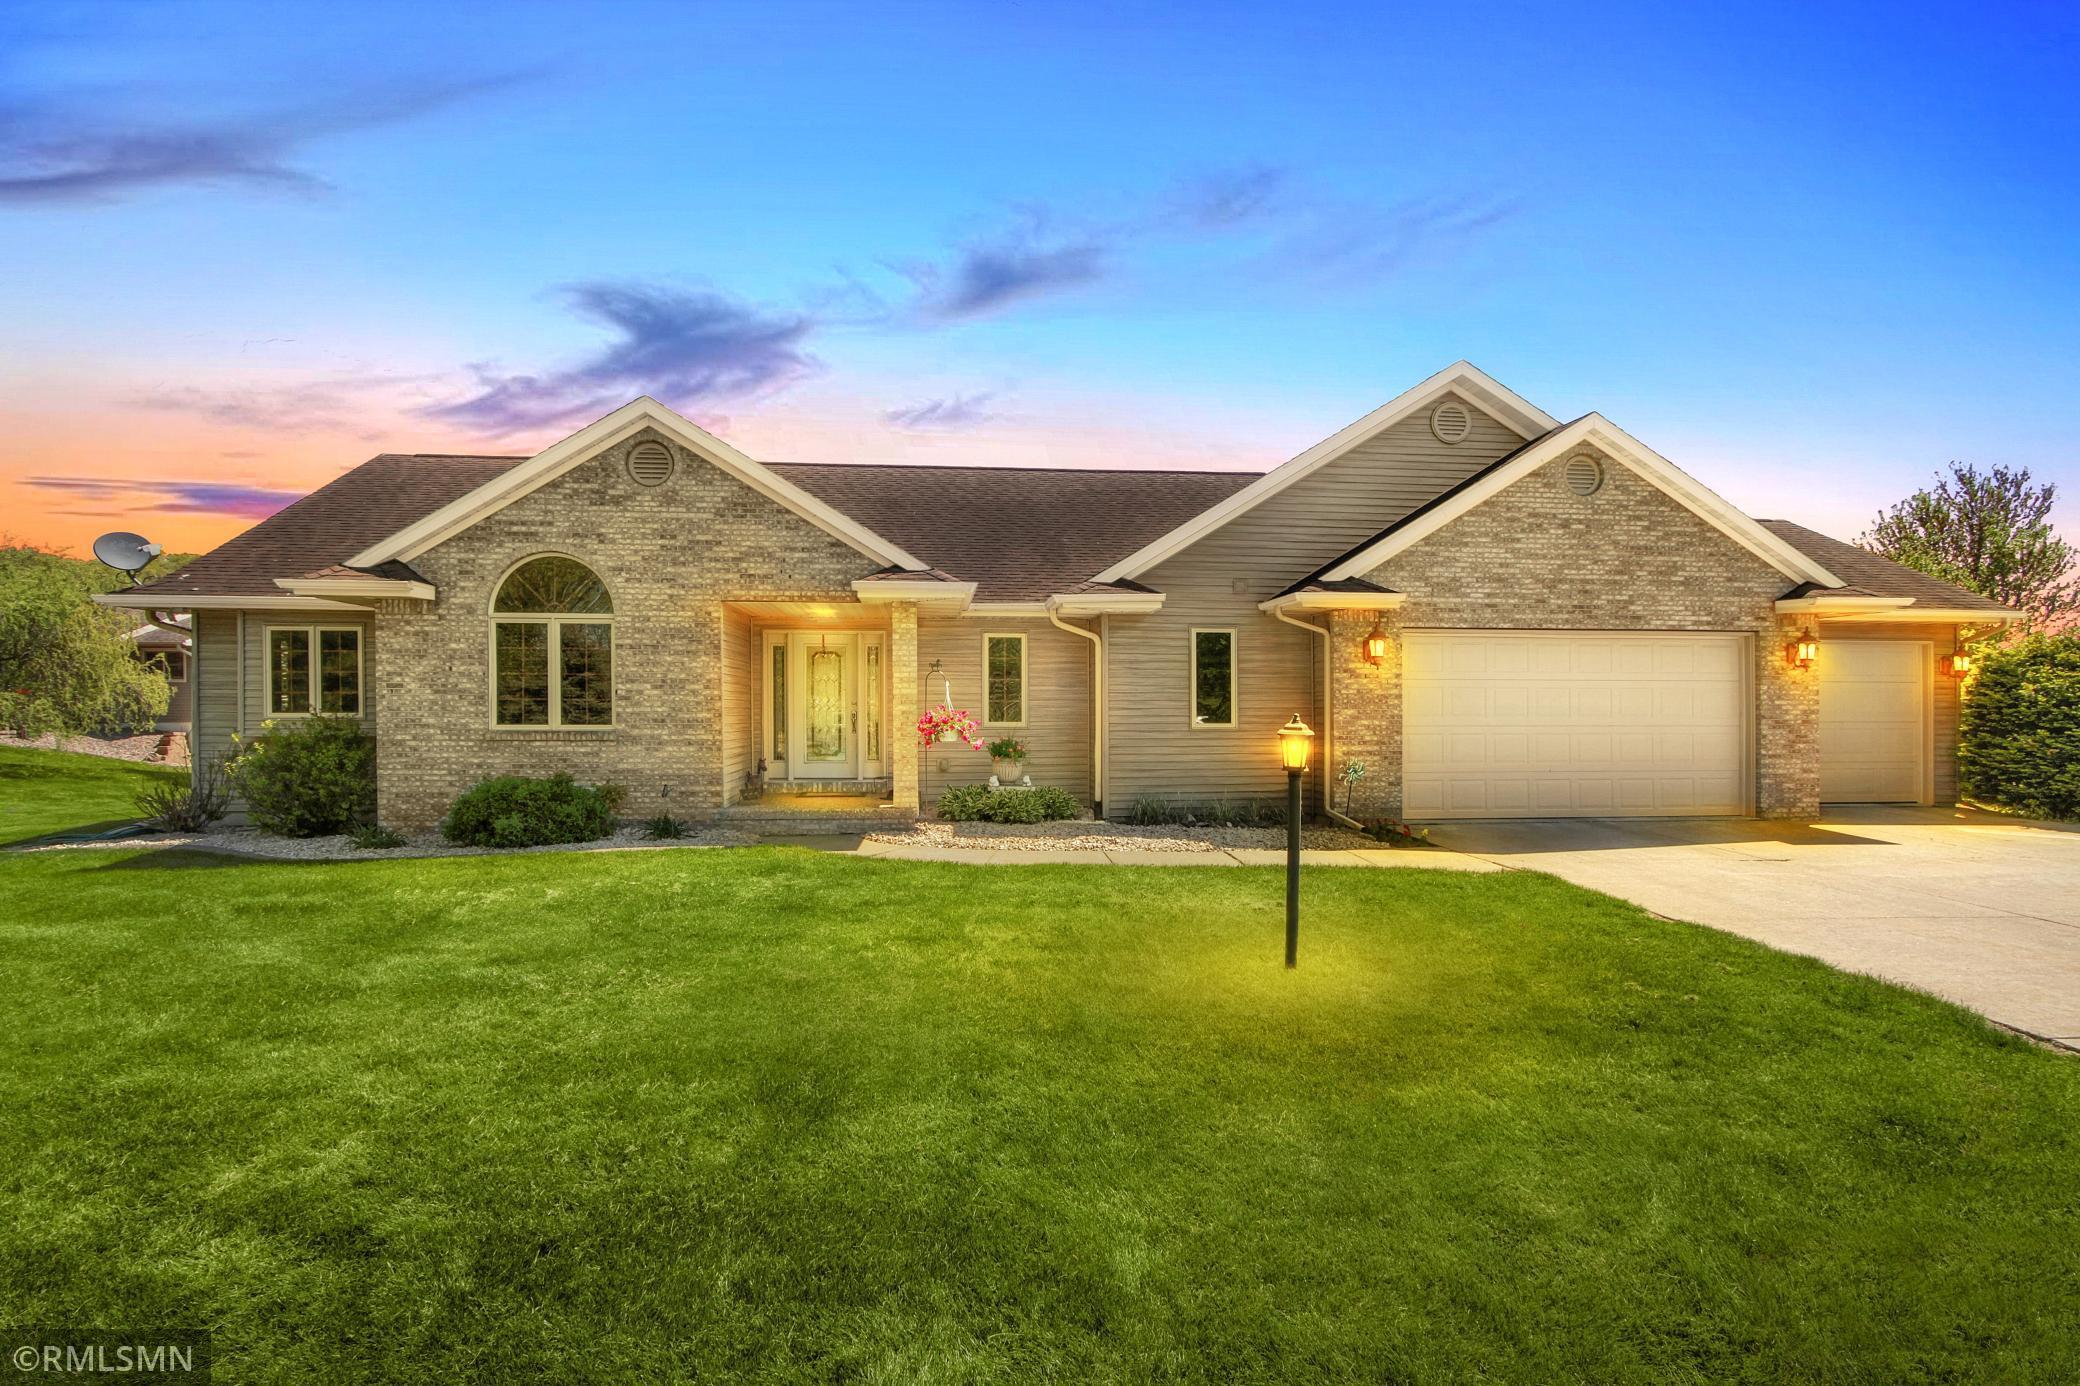 N5624 County Road M Property Photo 1